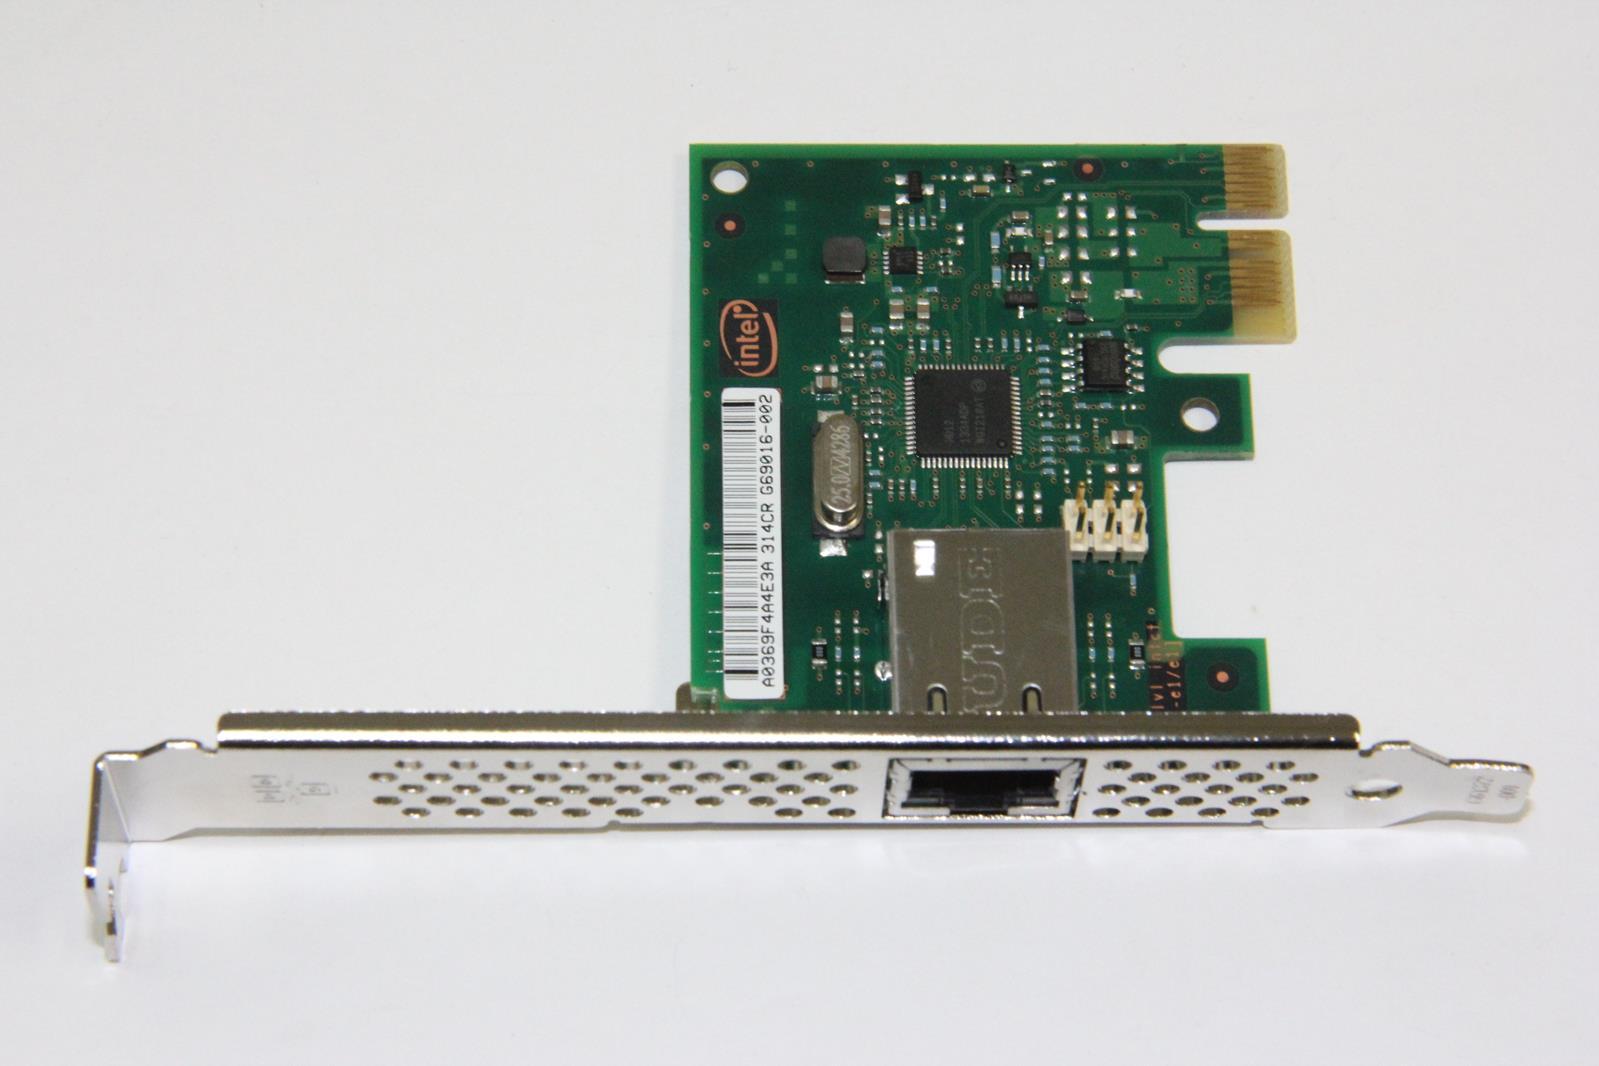 Details about INTEL I210-T1 Single Port PCI-Express X1 Gigabit Ethernet Card